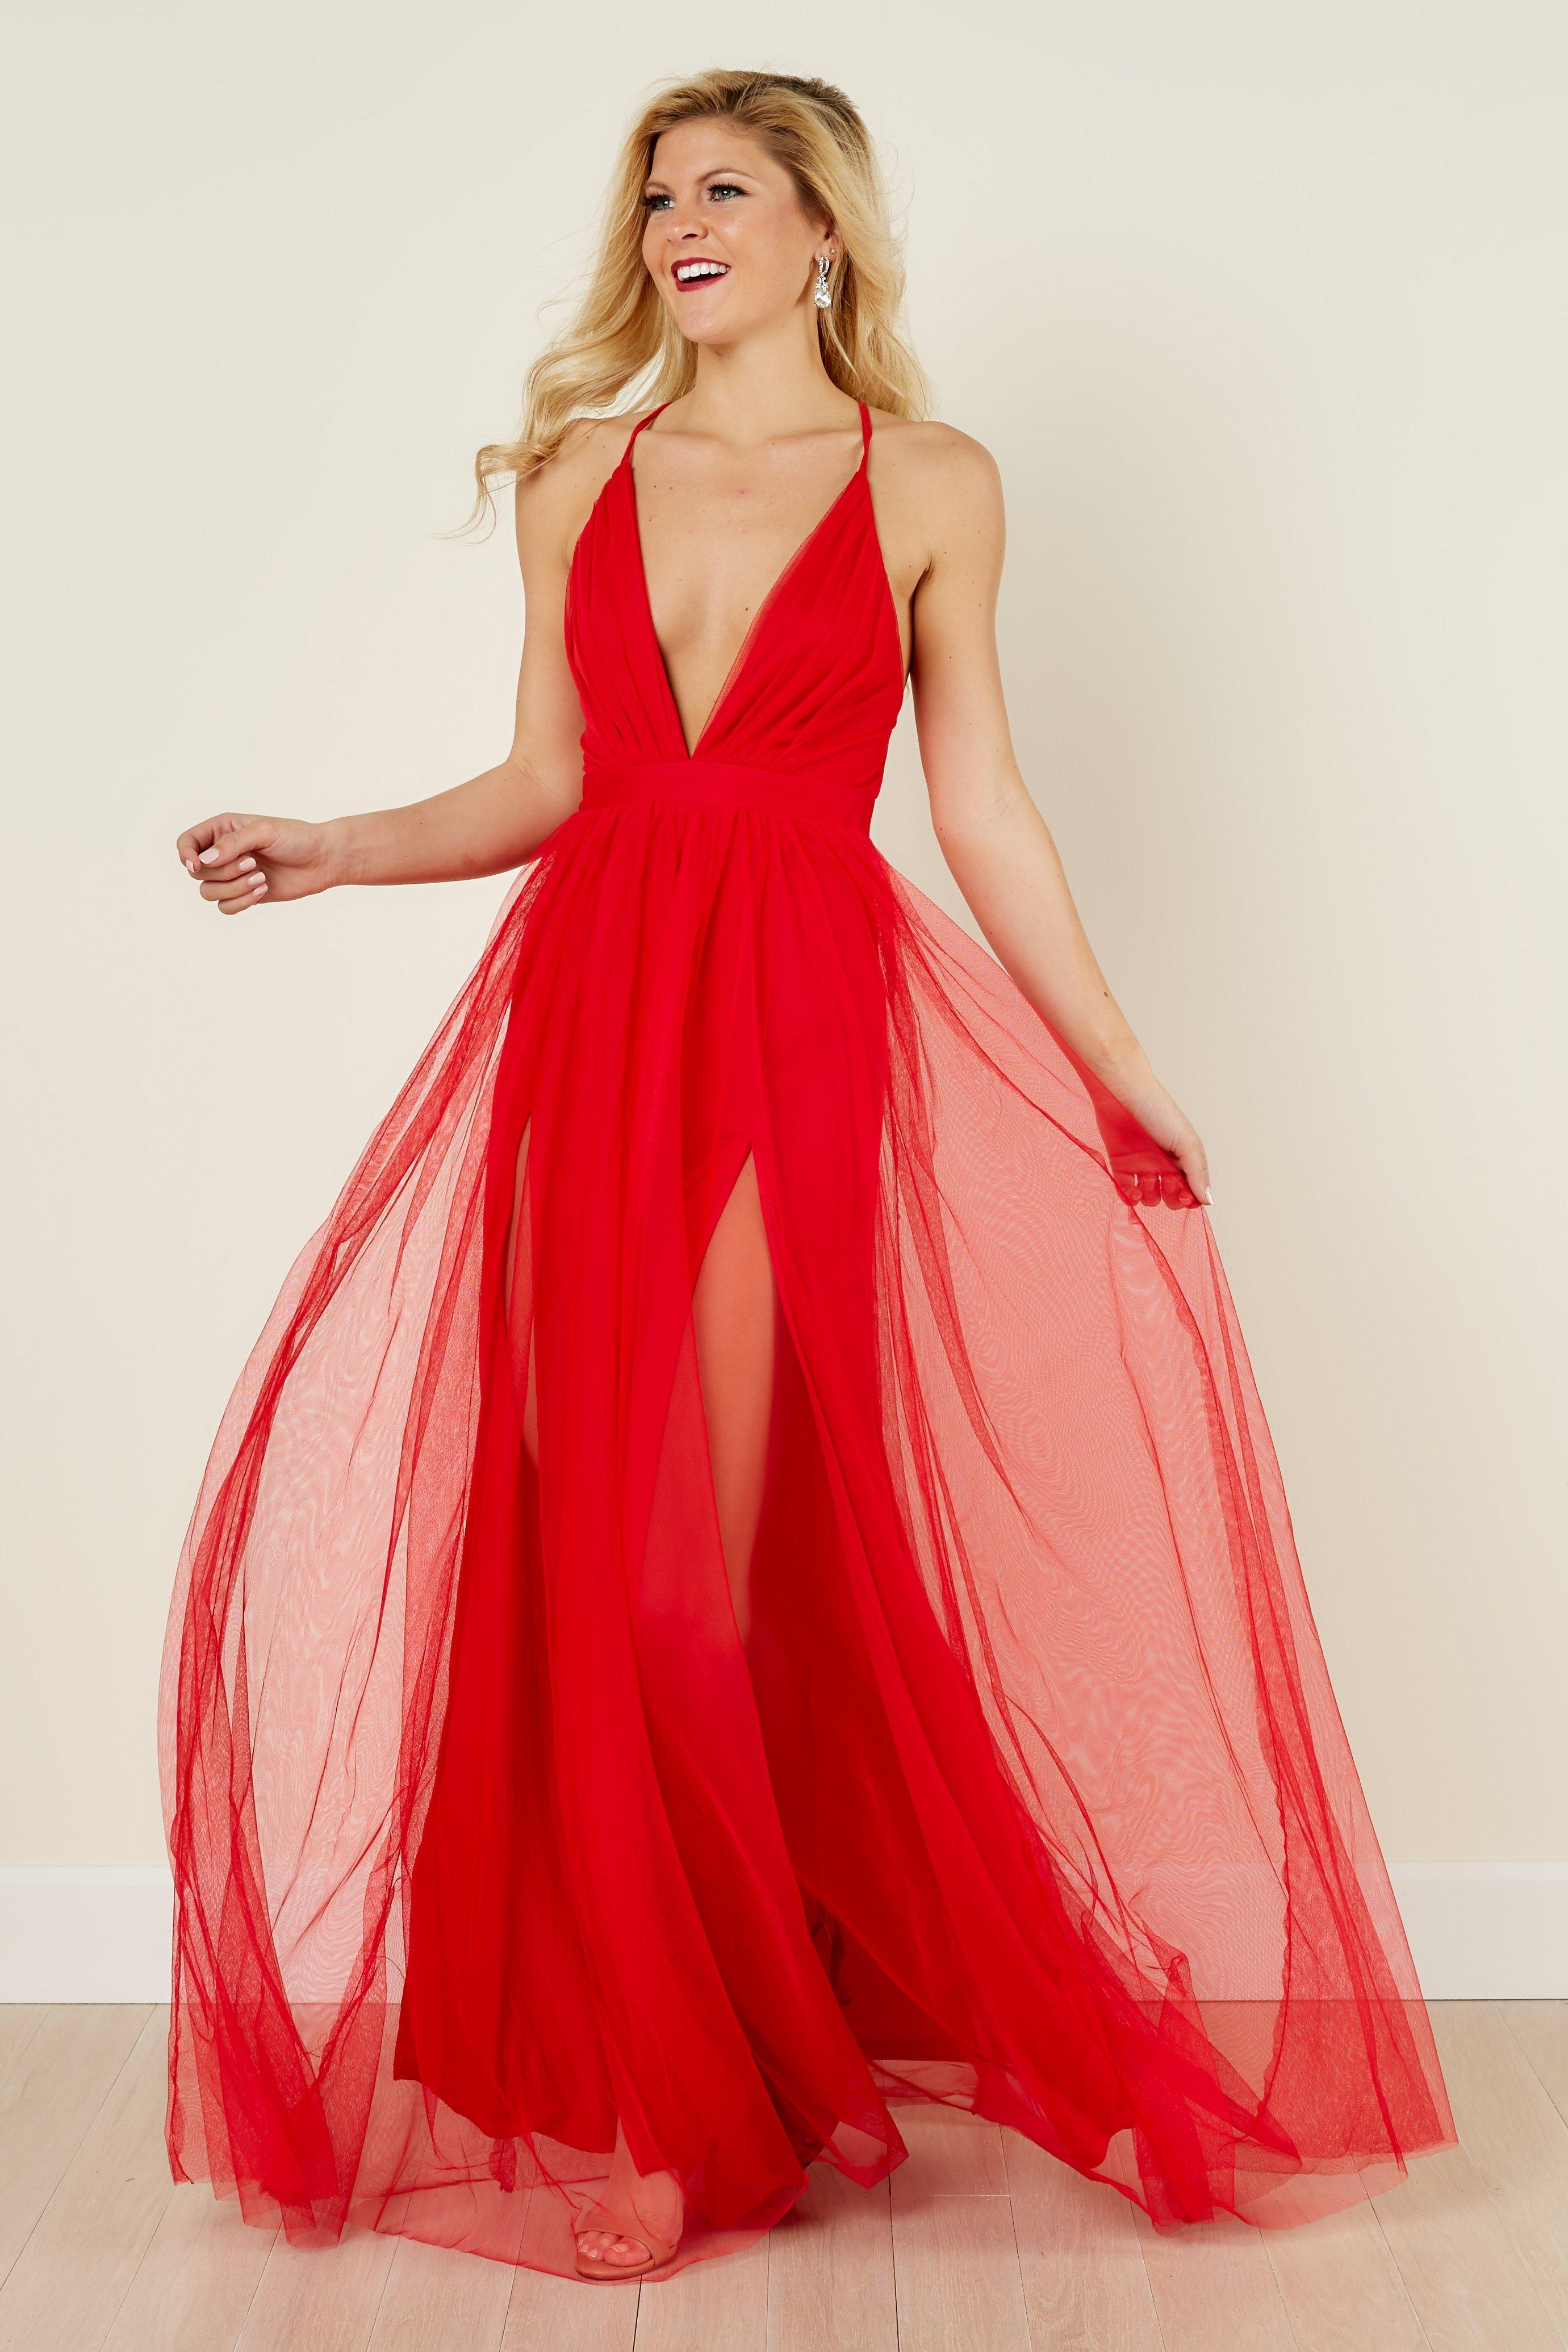 Red Dress elegant red dress - maxi dress - deep v neck dress - $54.00 - red MKYMTZI